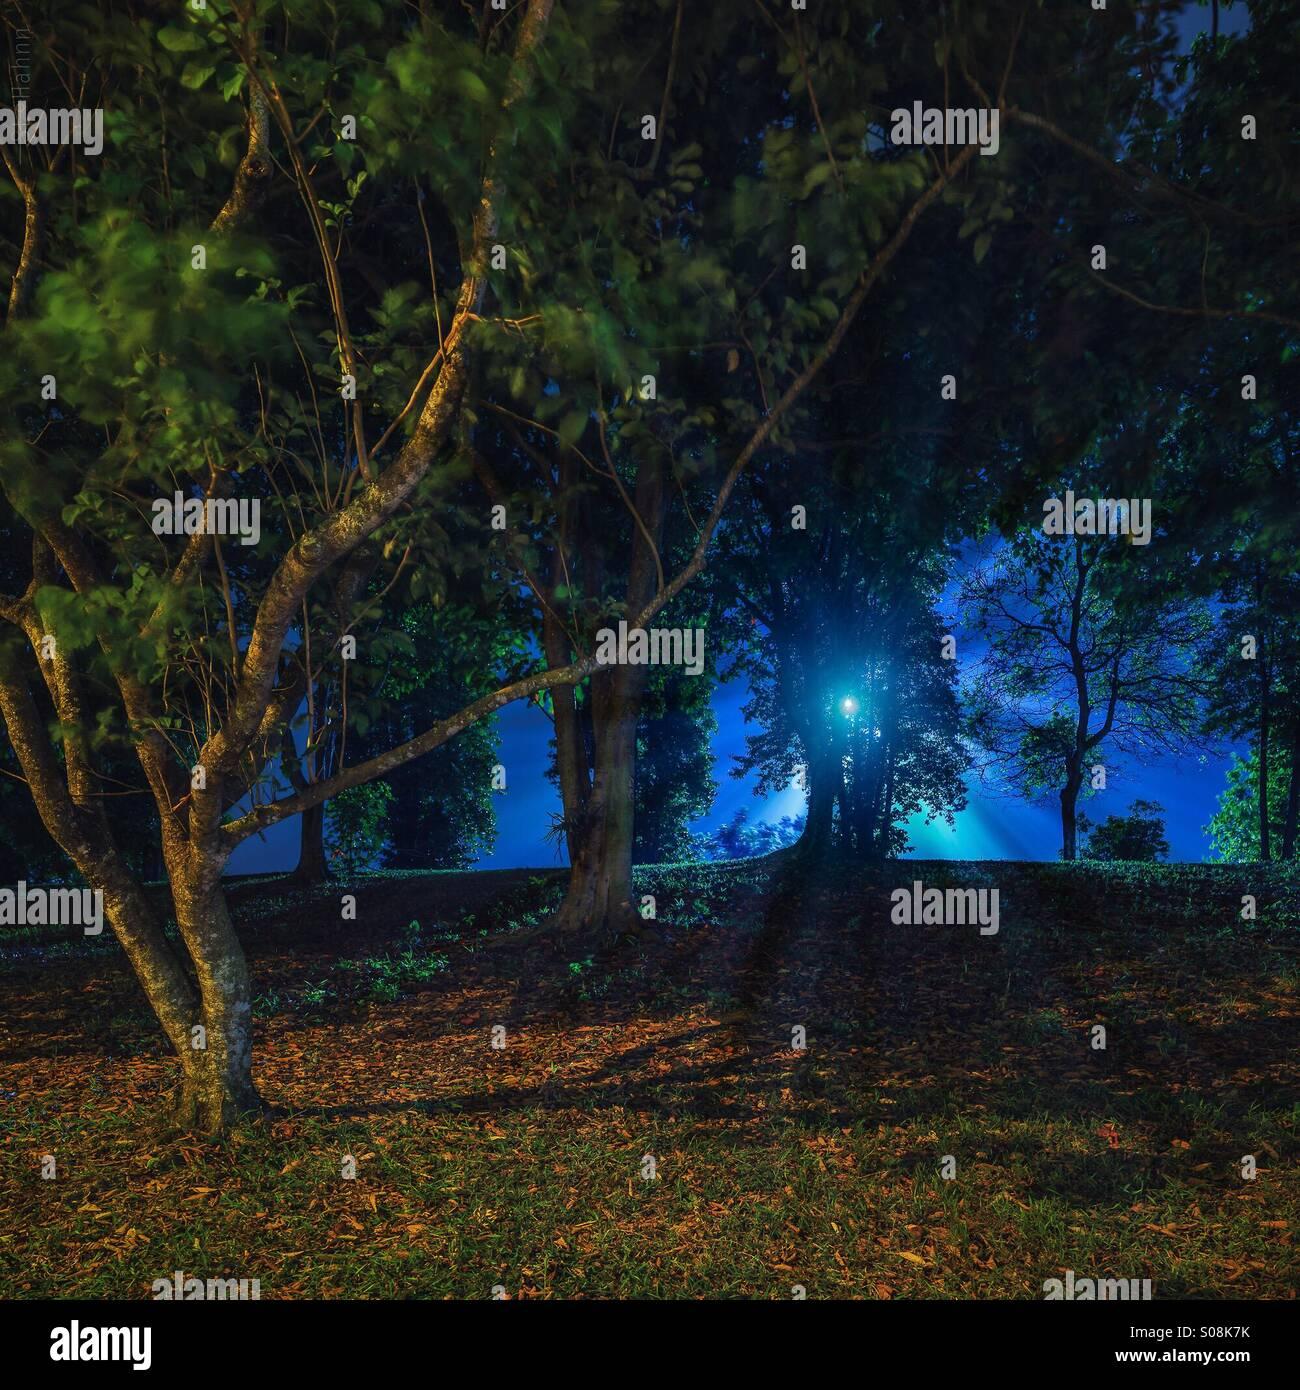 Blue light - Stock Image